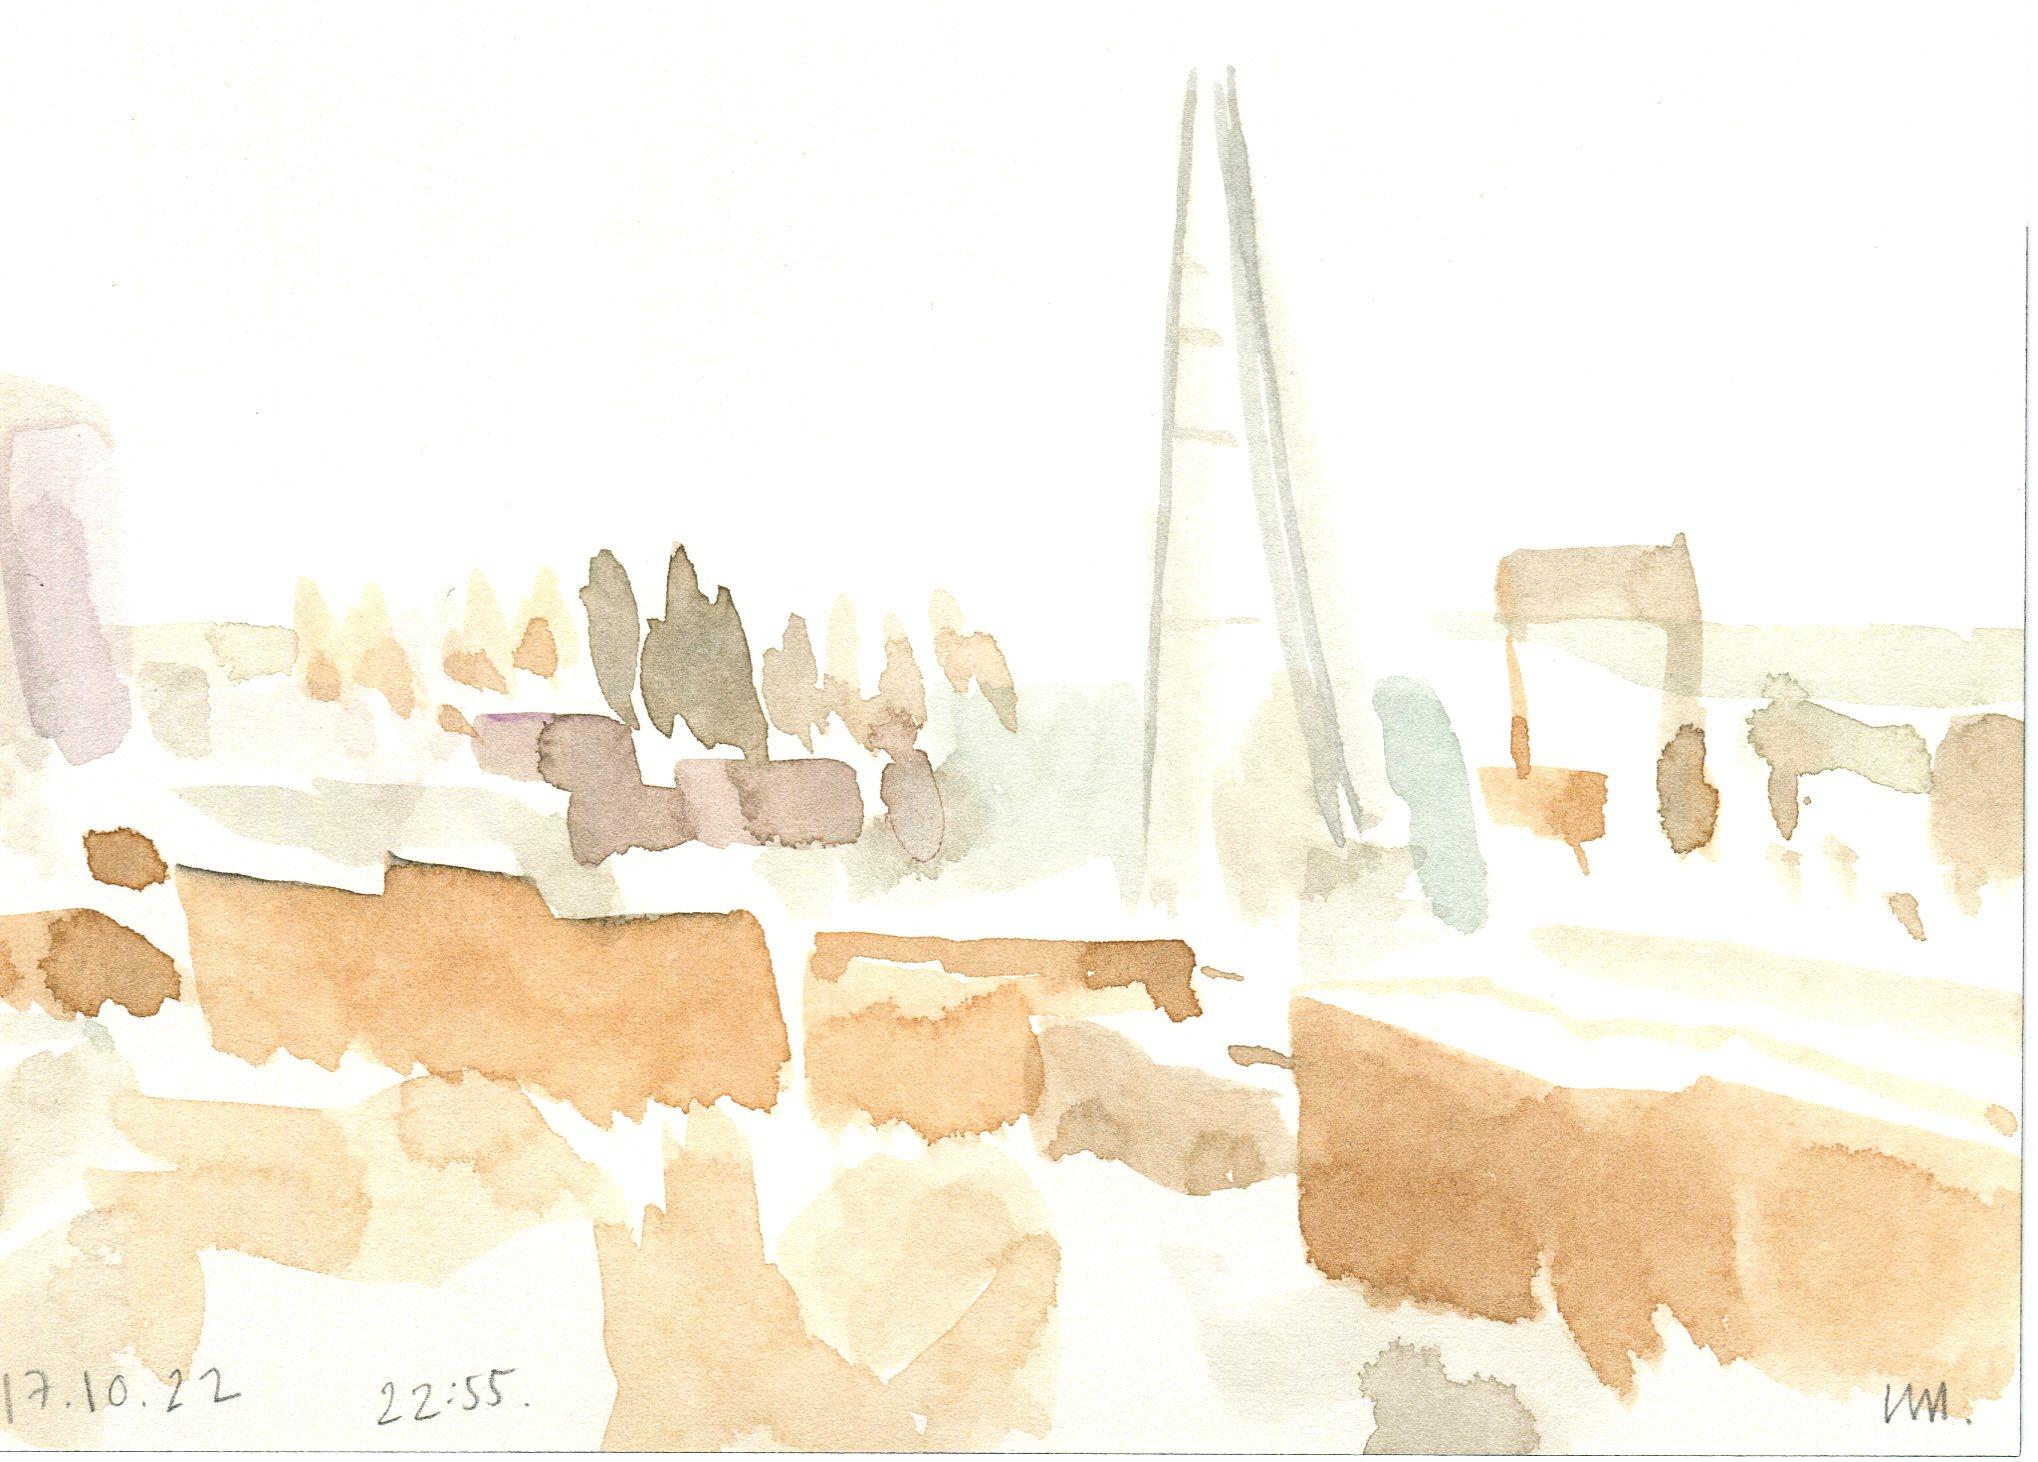 2017-10-27 drawing008.jpg